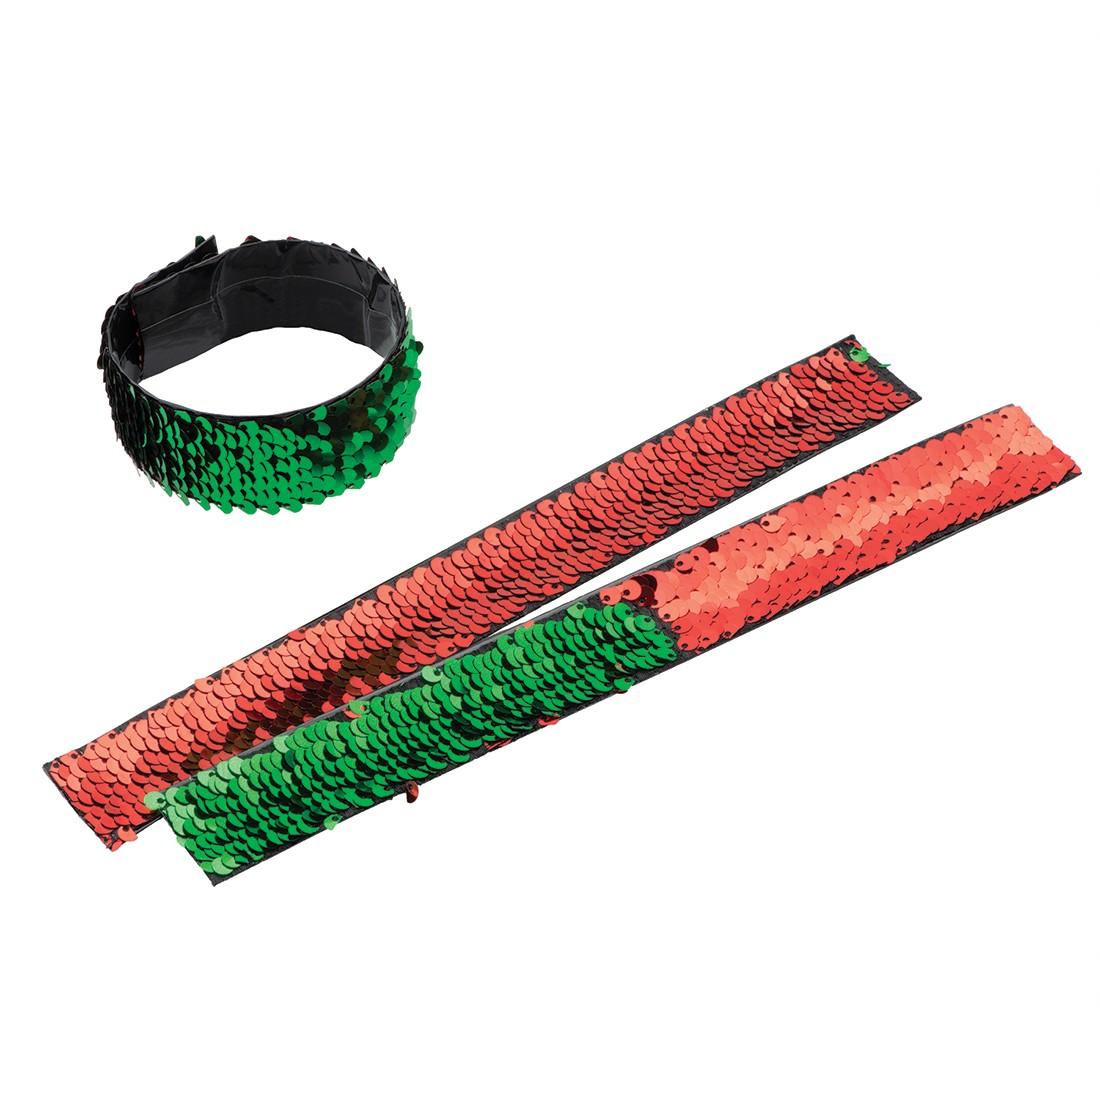 Christmas Reversible Sequin Slap Bracelets [image]